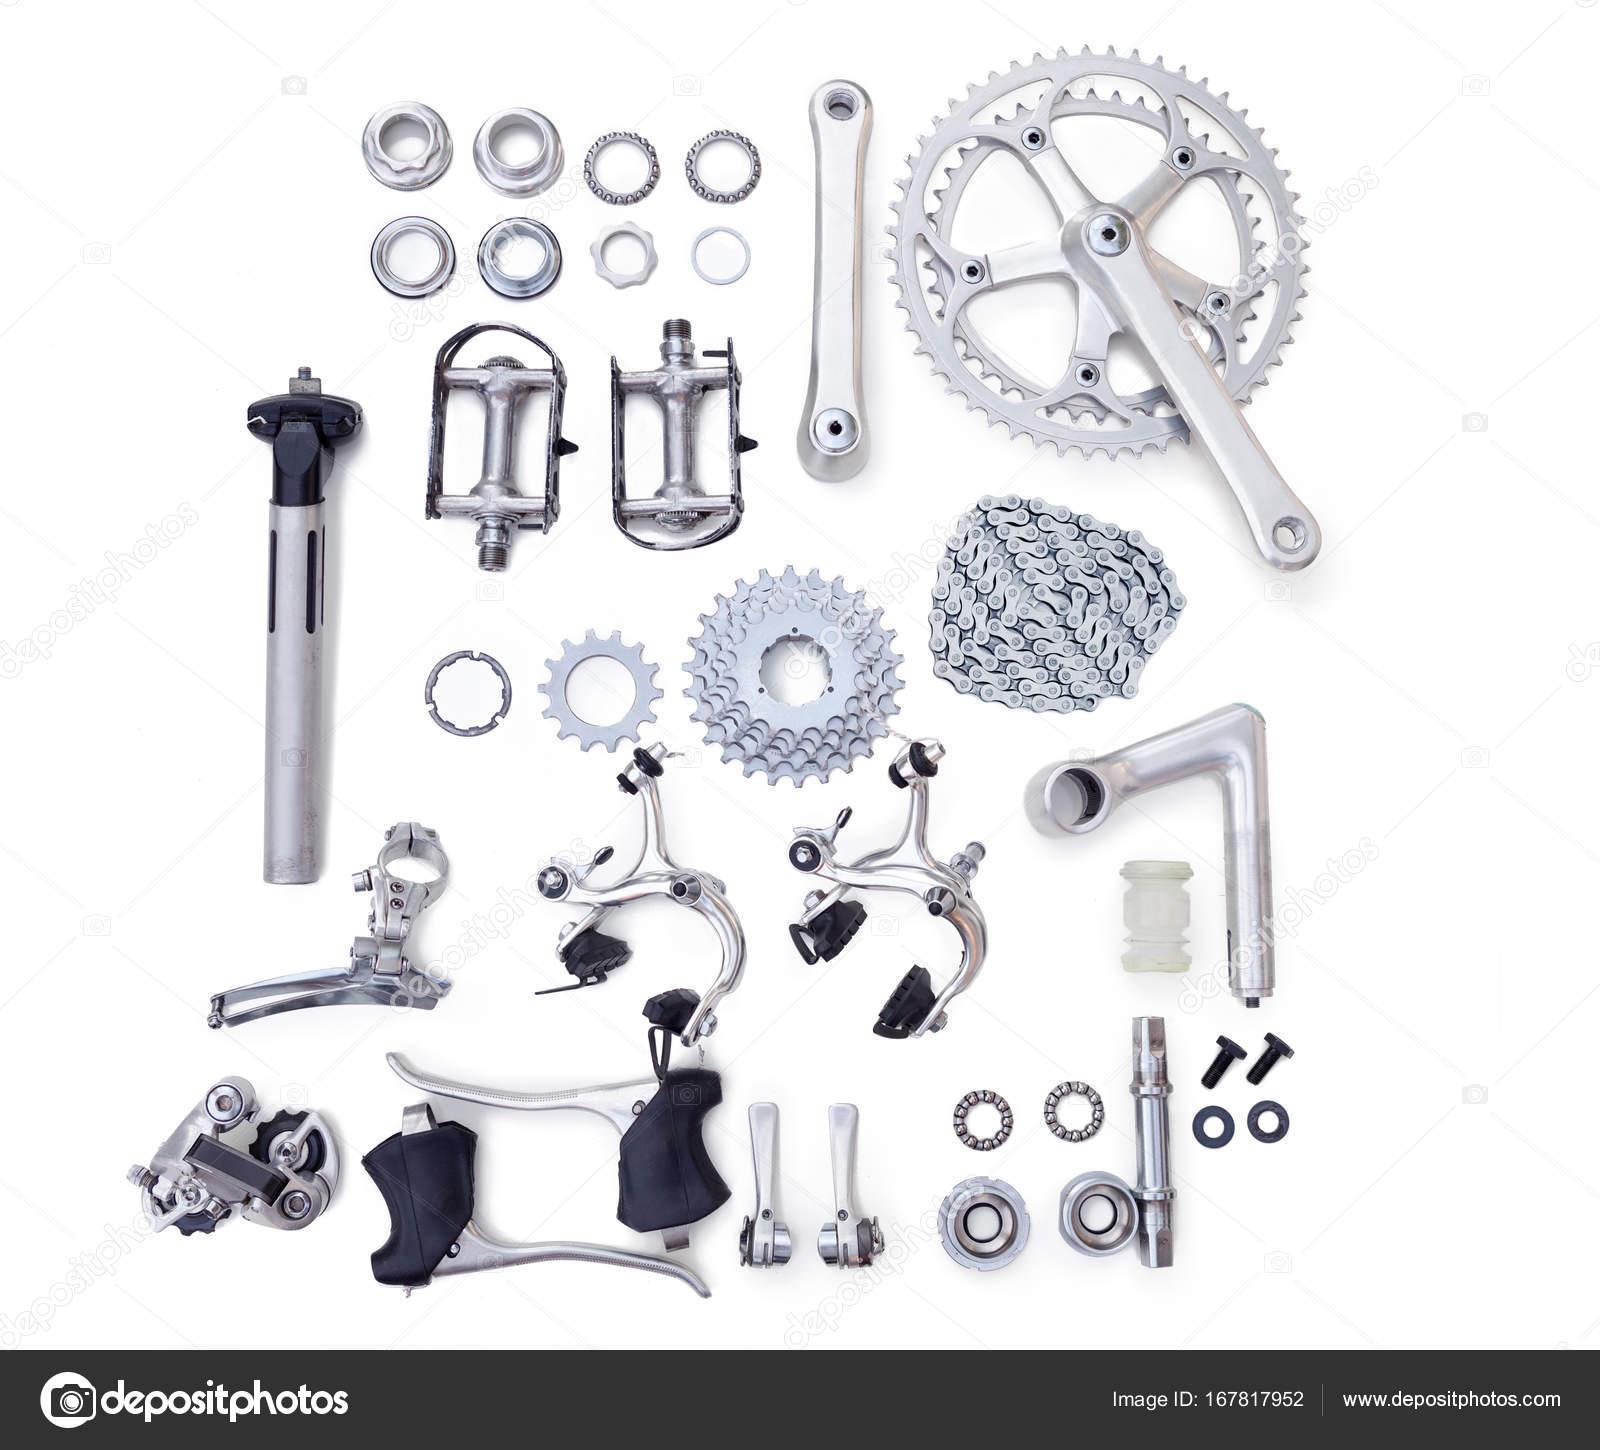 fahrrad reparatur fahrrad ersatzteile stockfoto. Black Bedroom Furniture Sets. Home Design Ideas